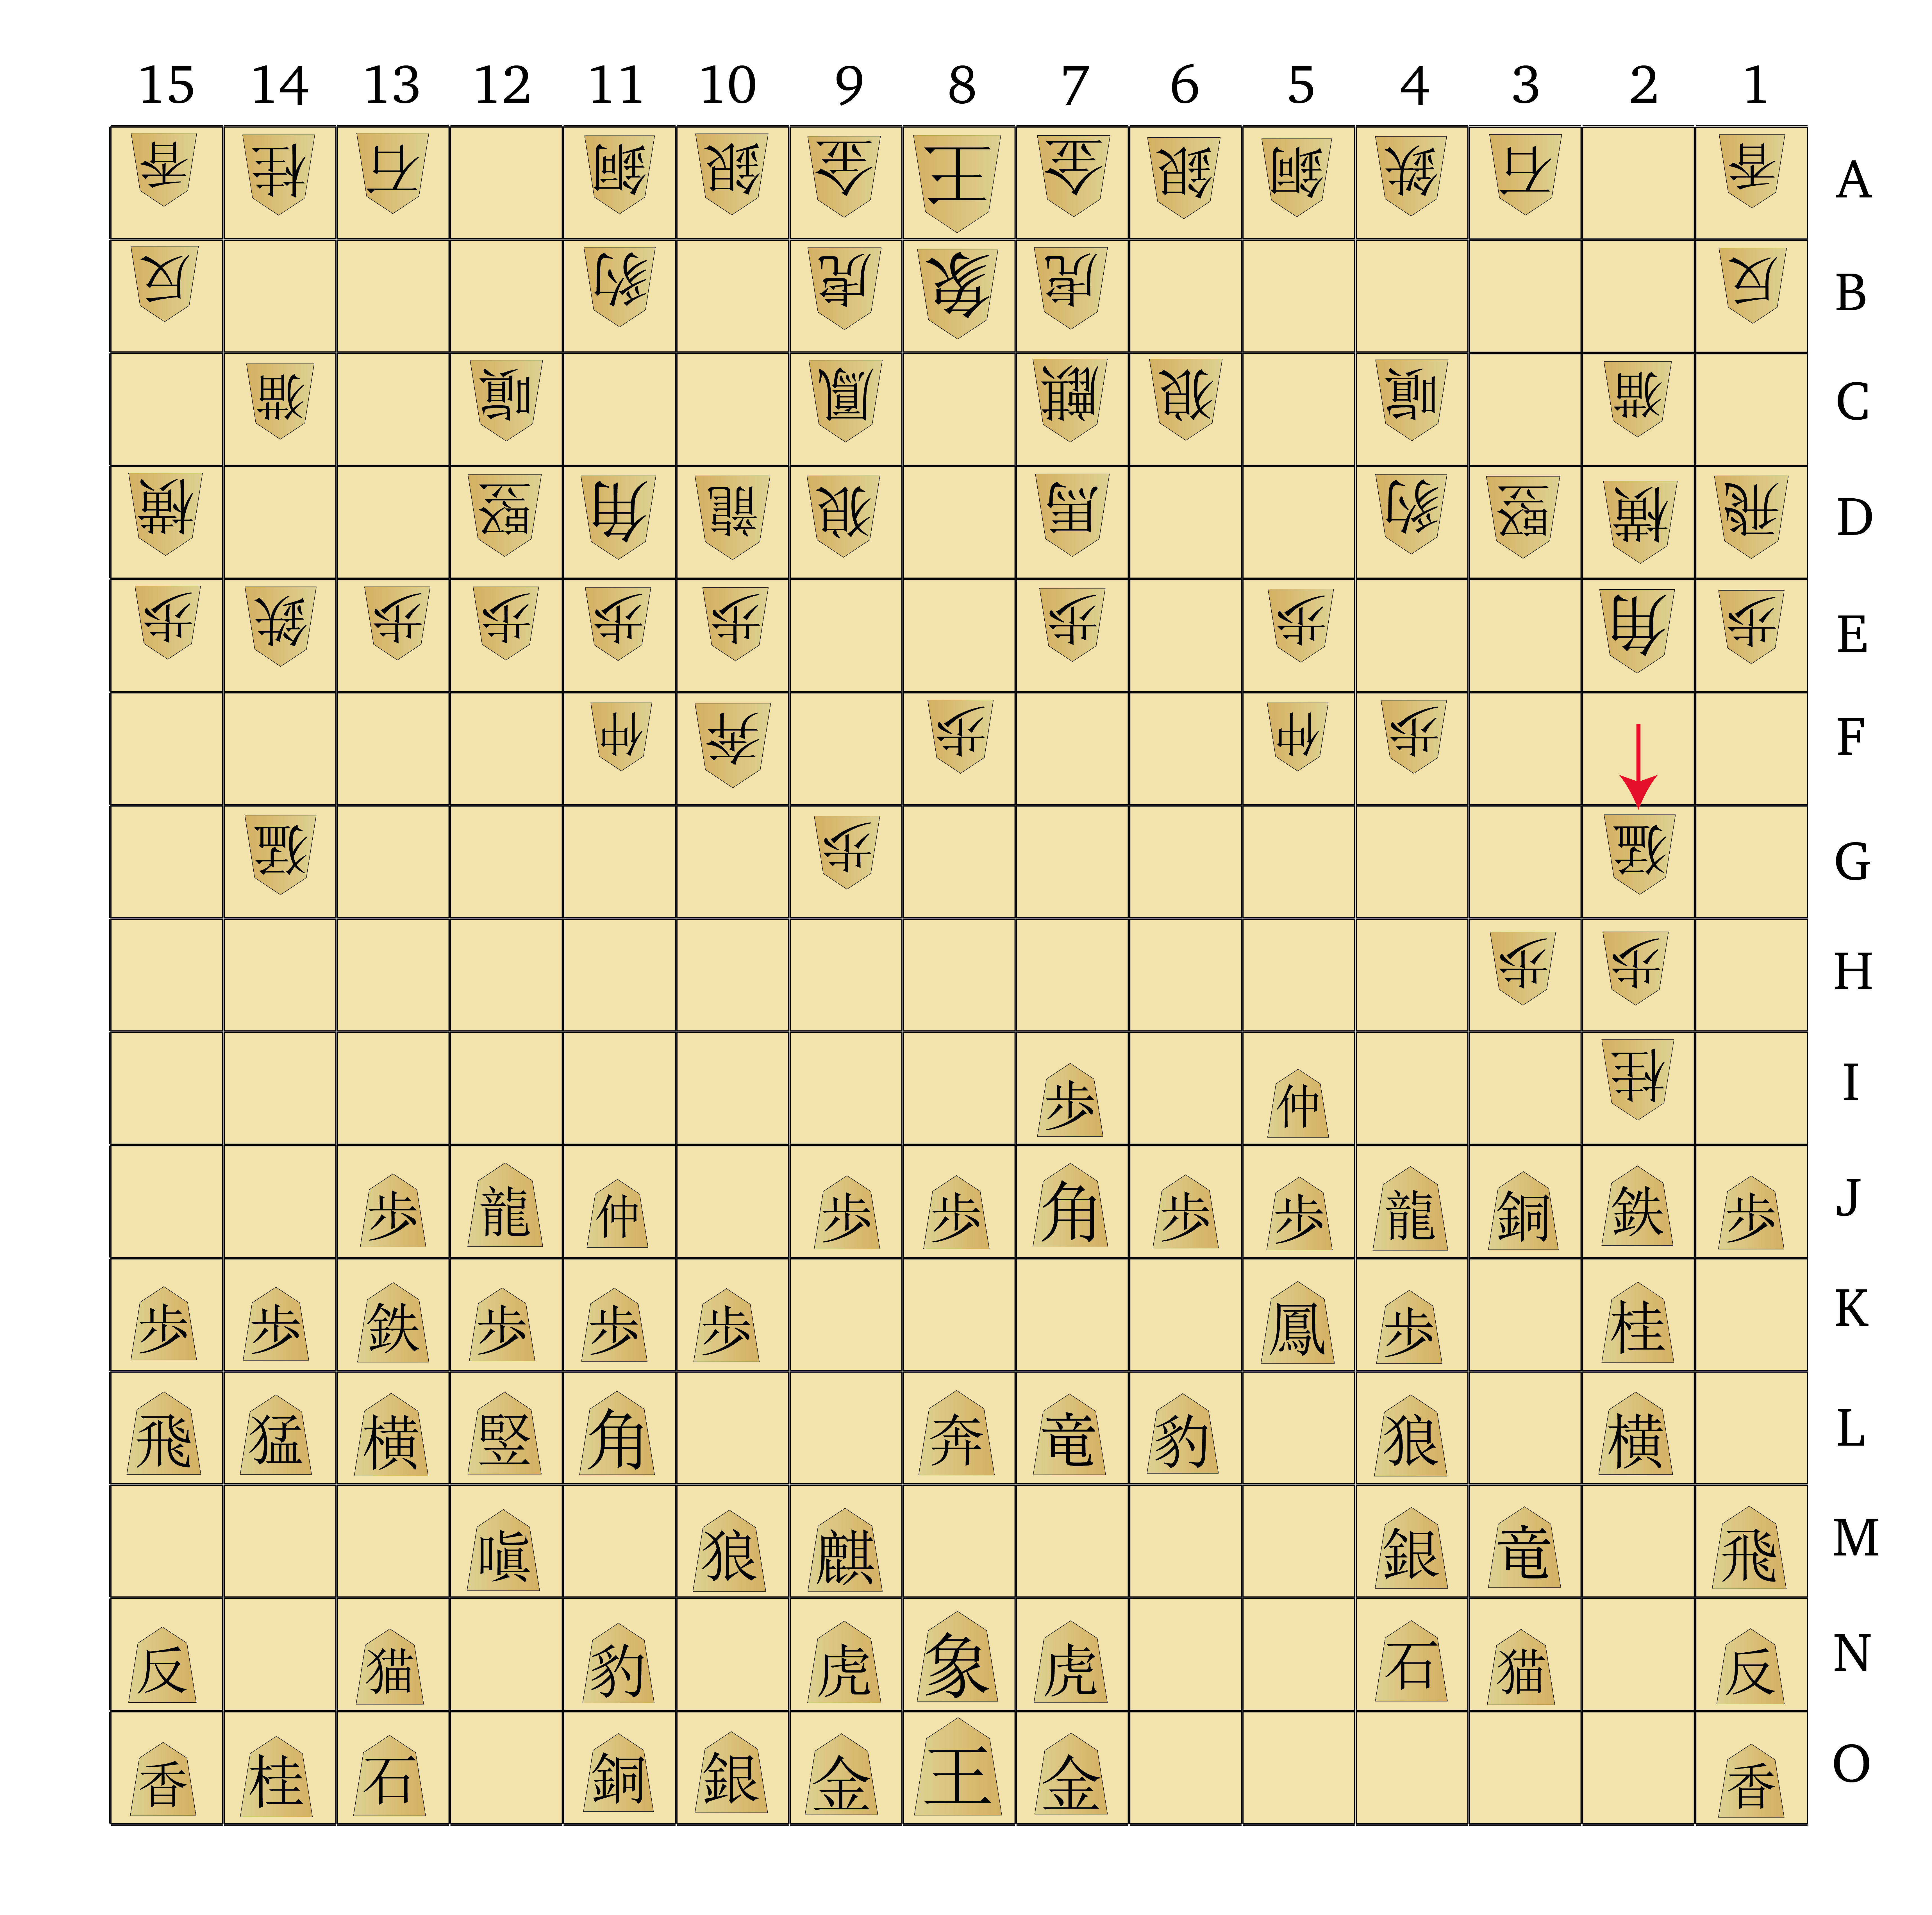 Dai Shogi 420 -- Move 130-01